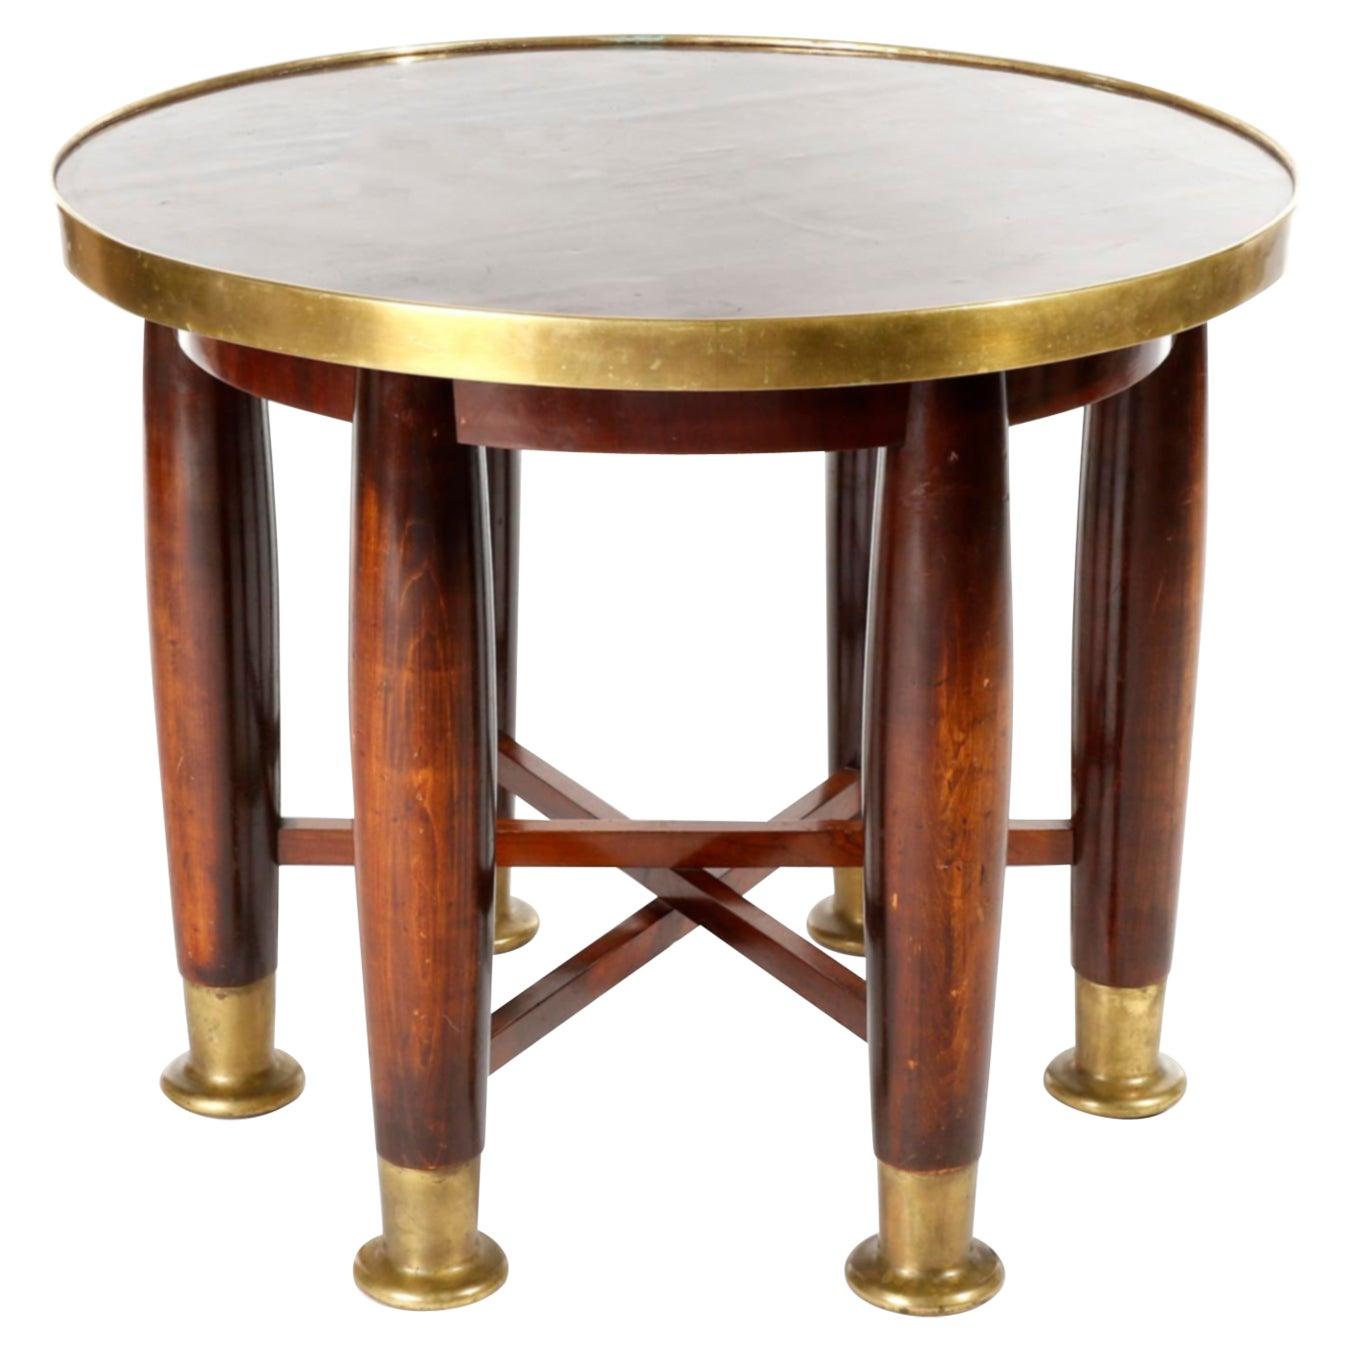 Adolf Loos Six-Legged 'Haberfeld' Table, F.O. Schmidt, Brass Wood, Austria, 1899